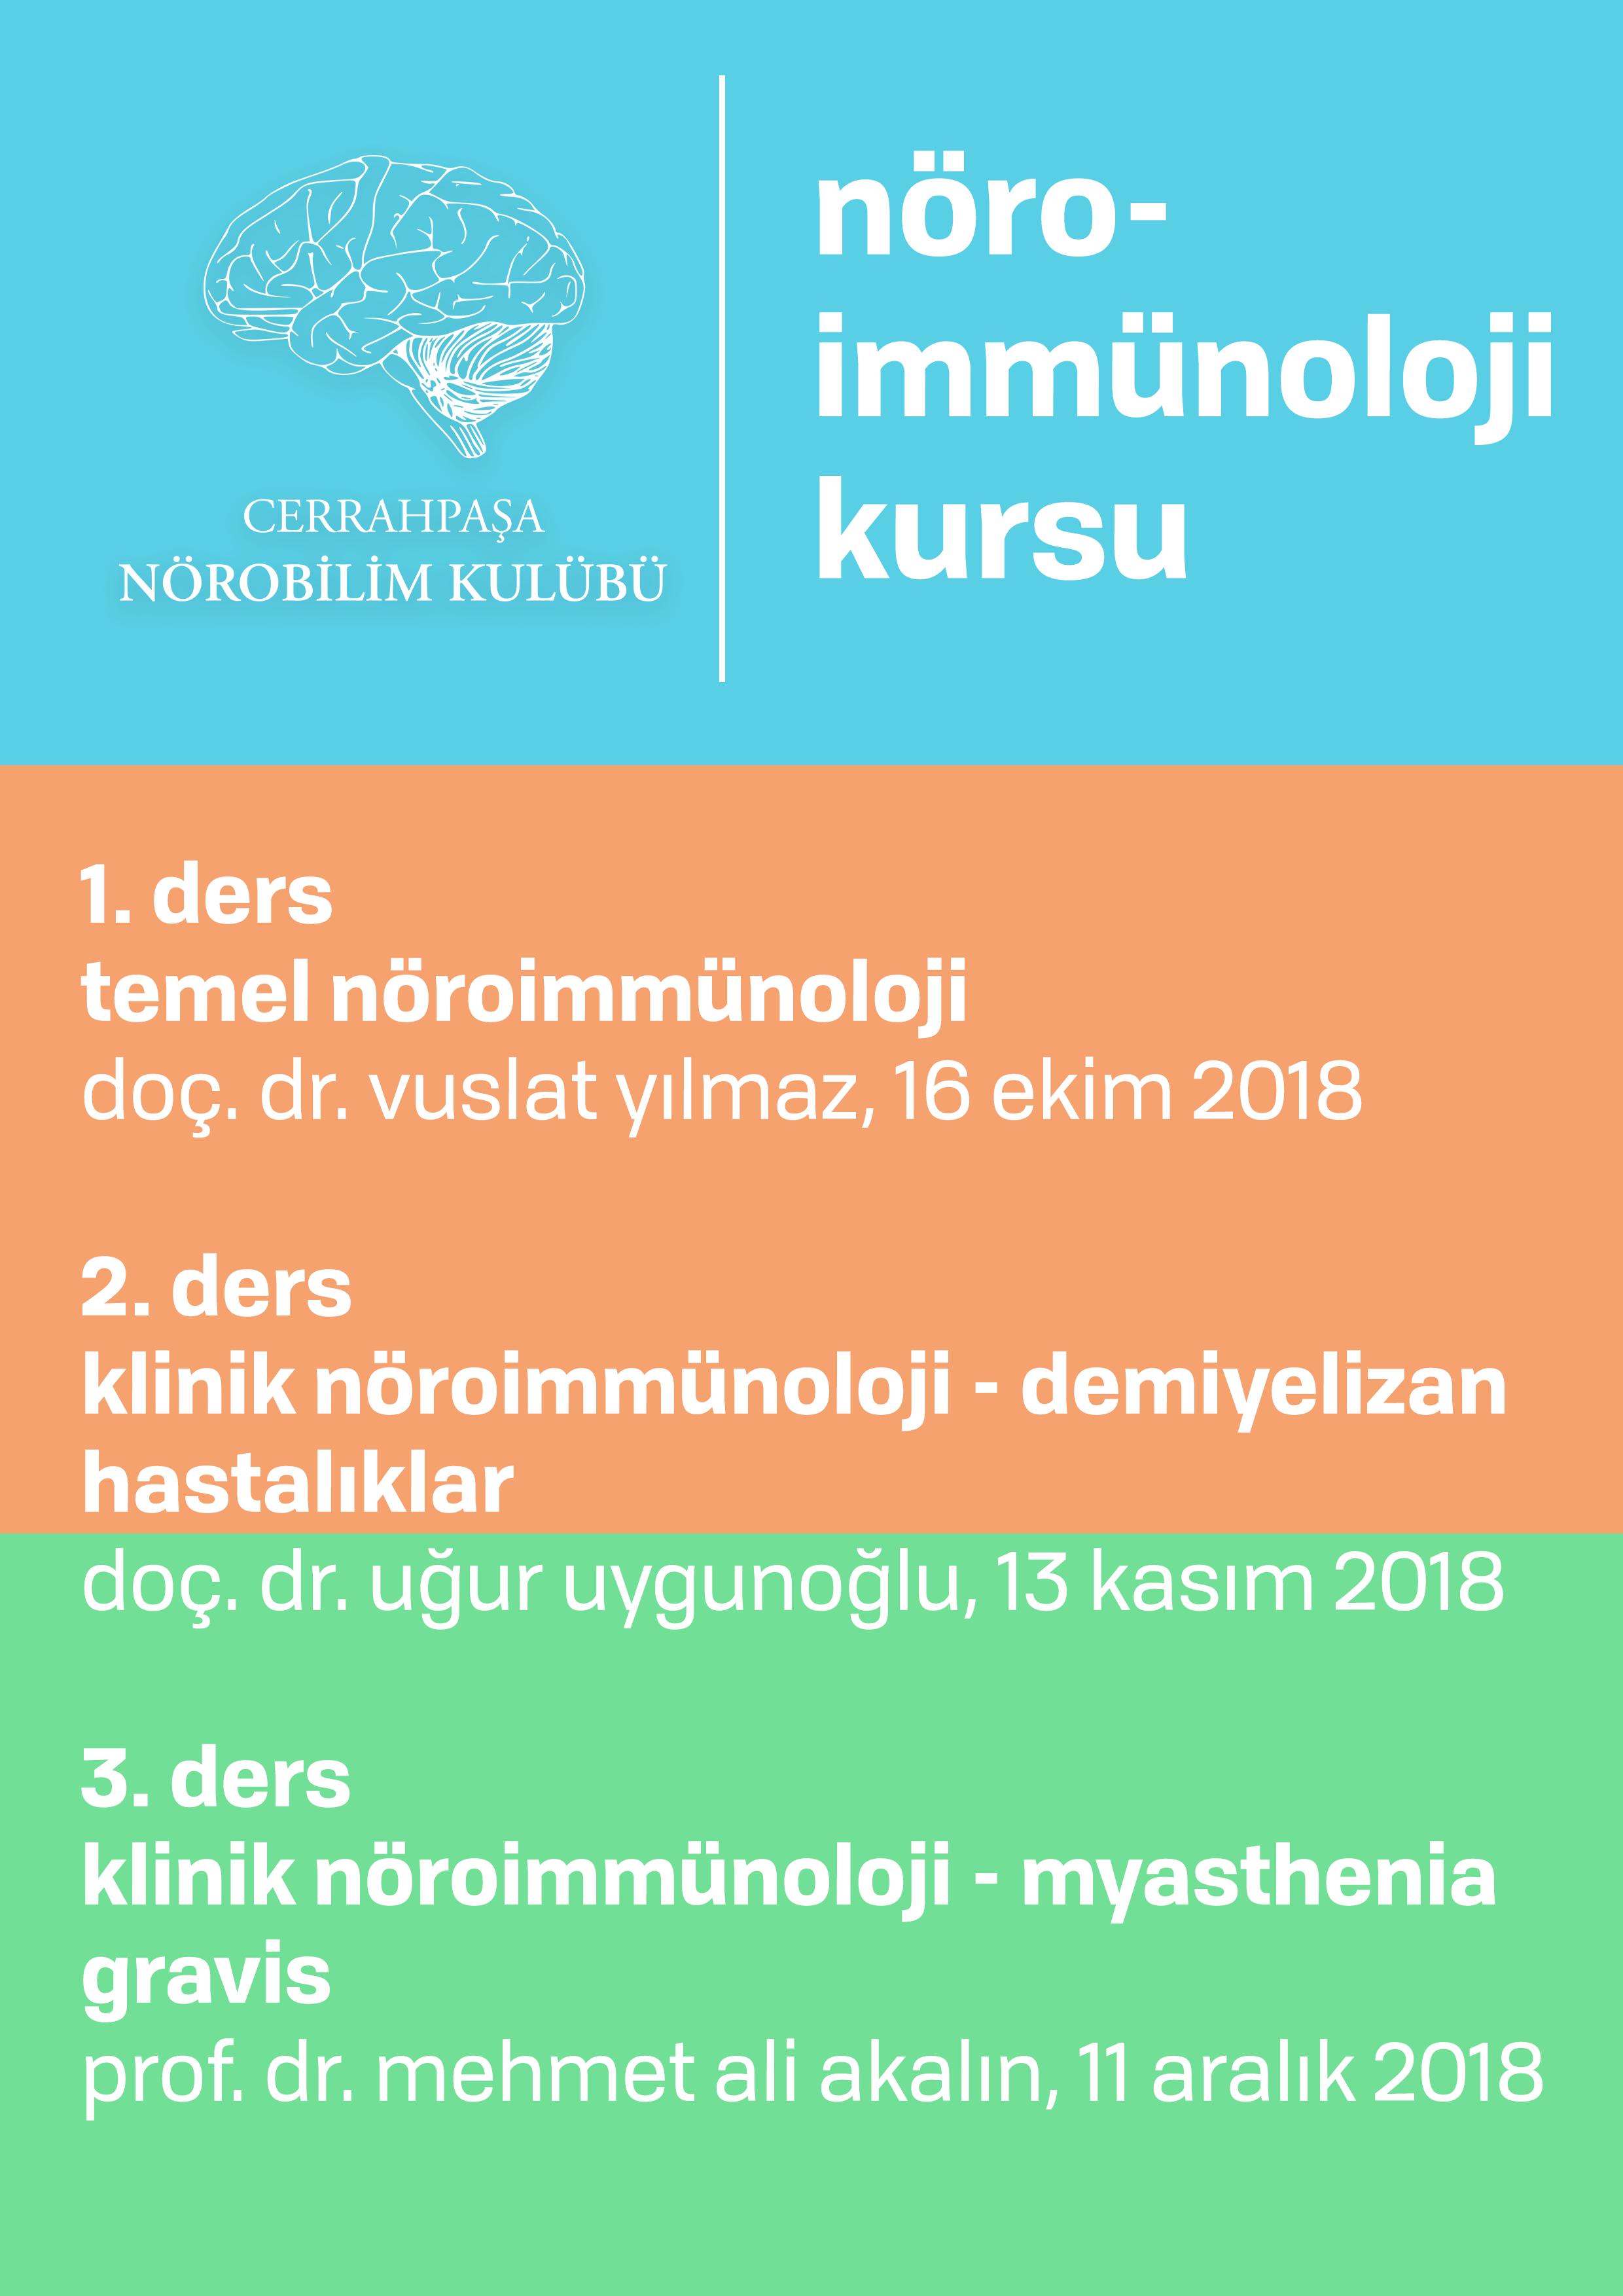 nöroimmünolojikursu.png